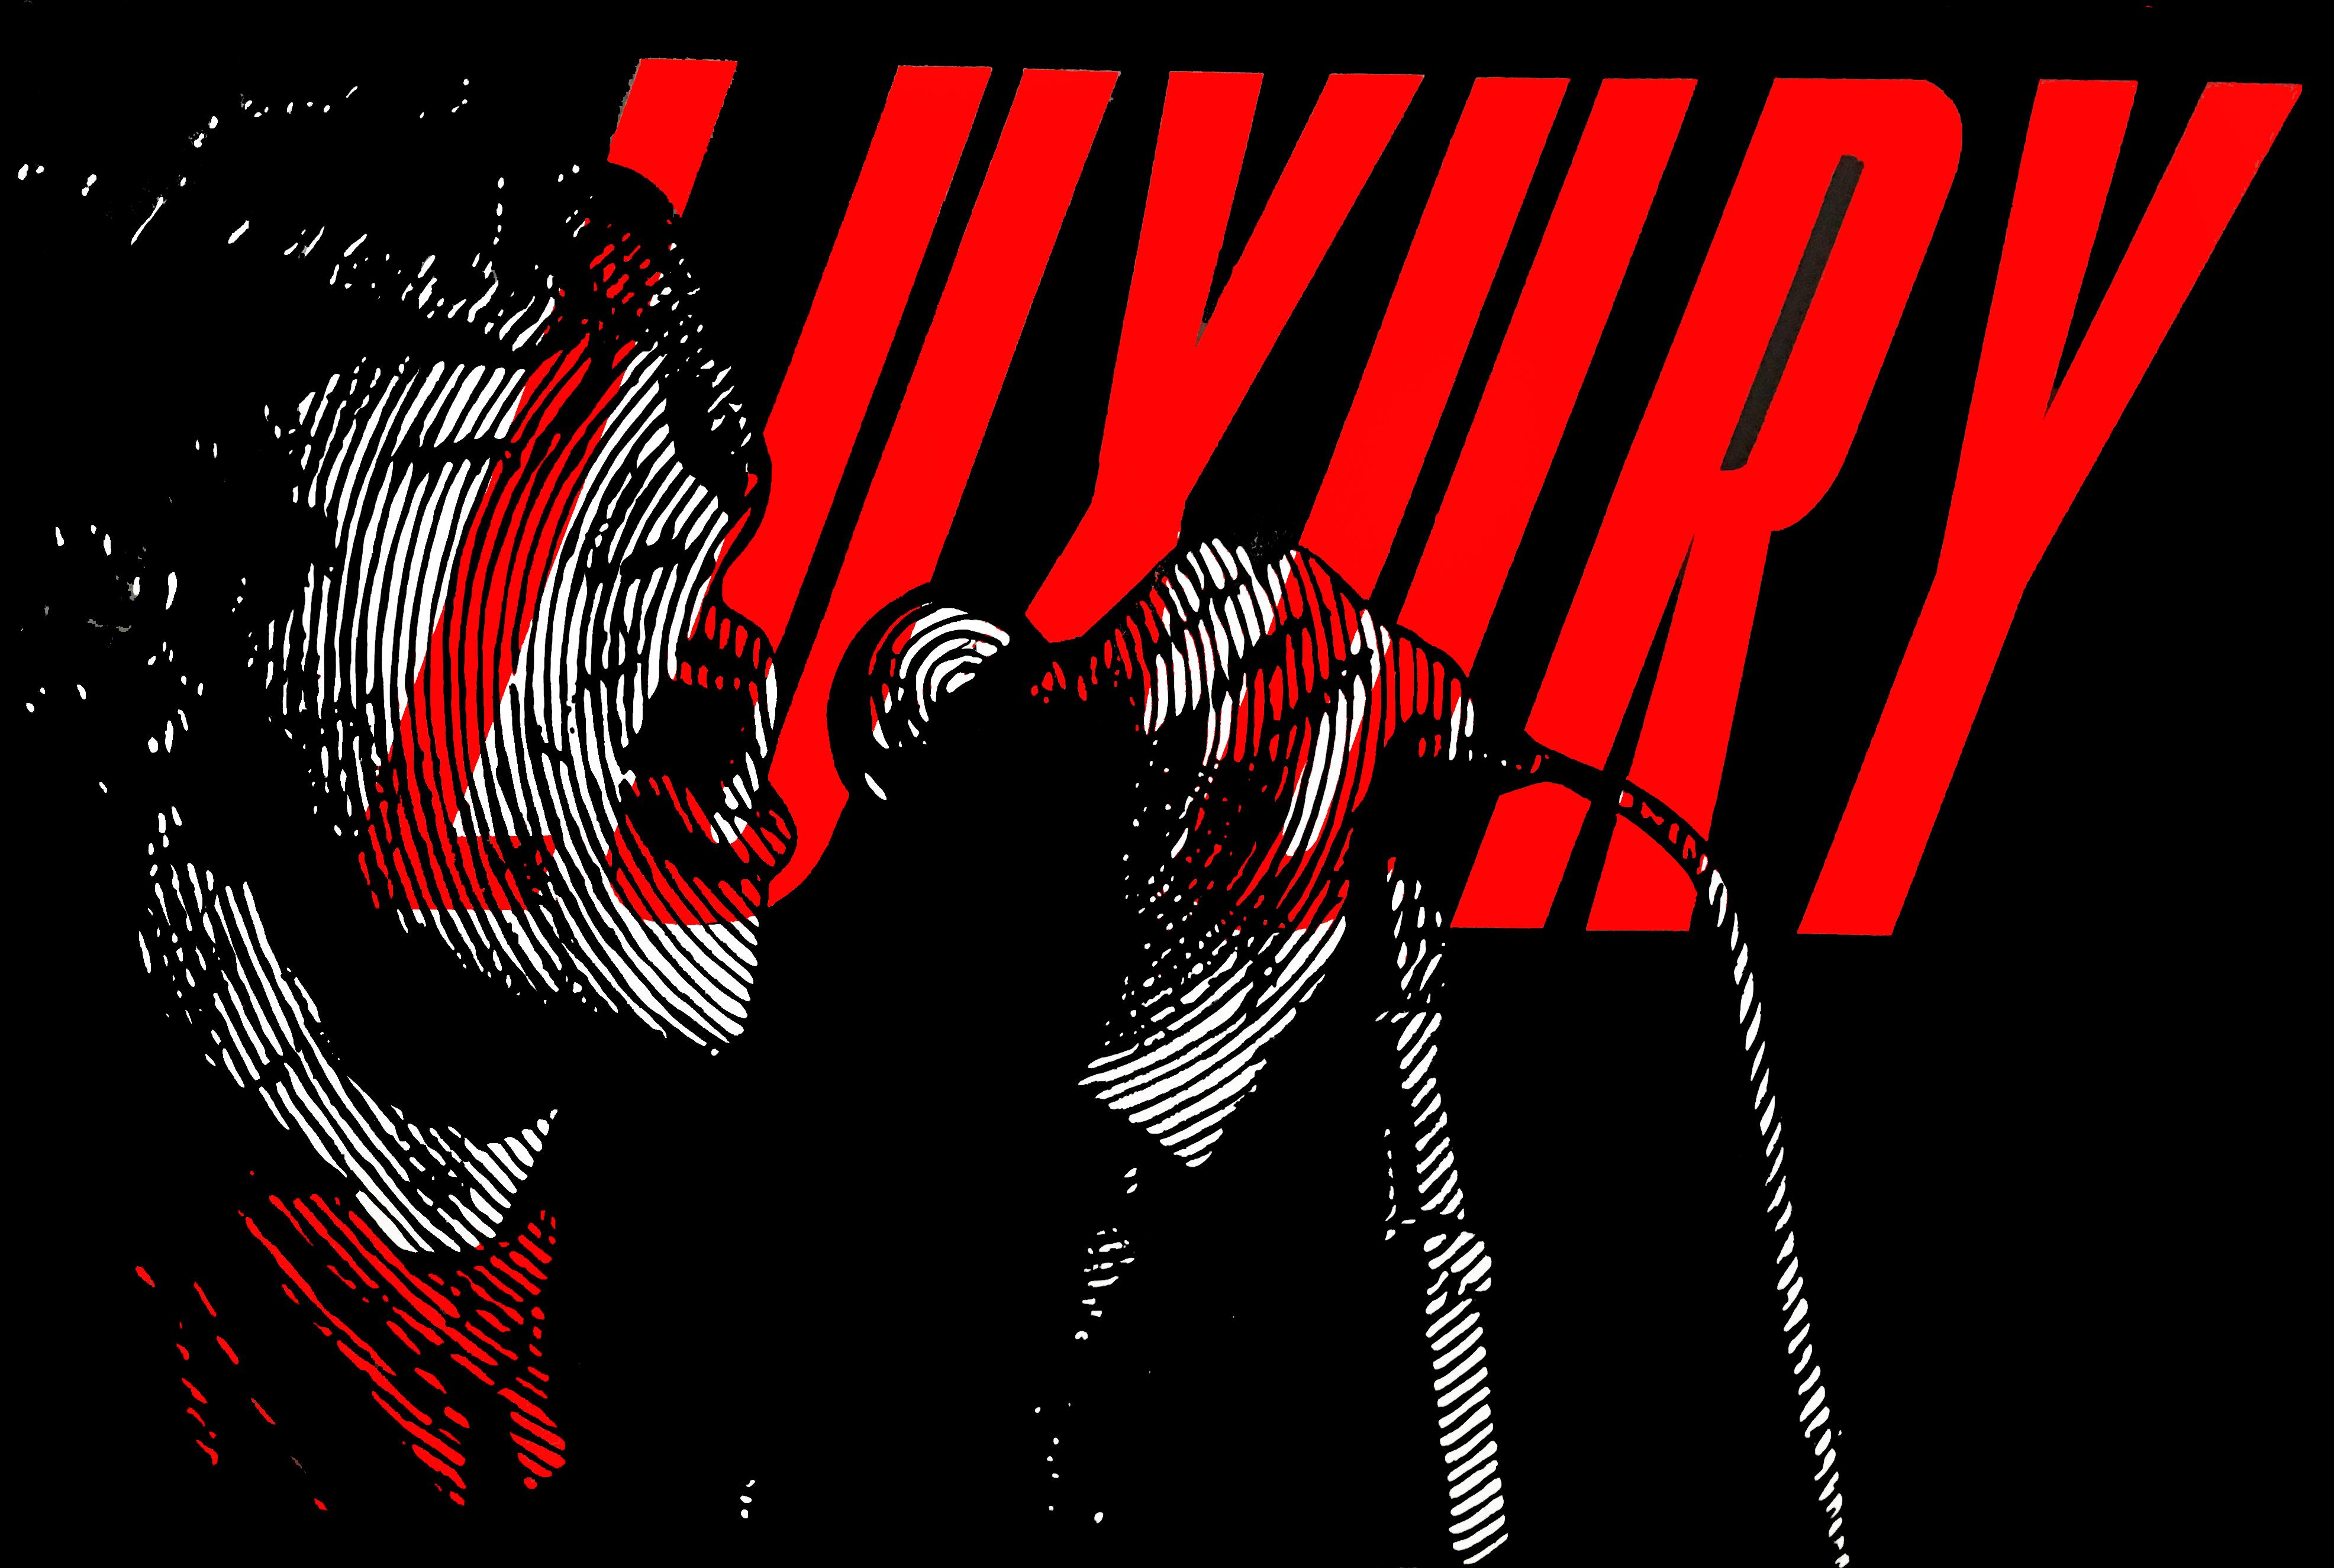 Luxury (Mick Jagger)